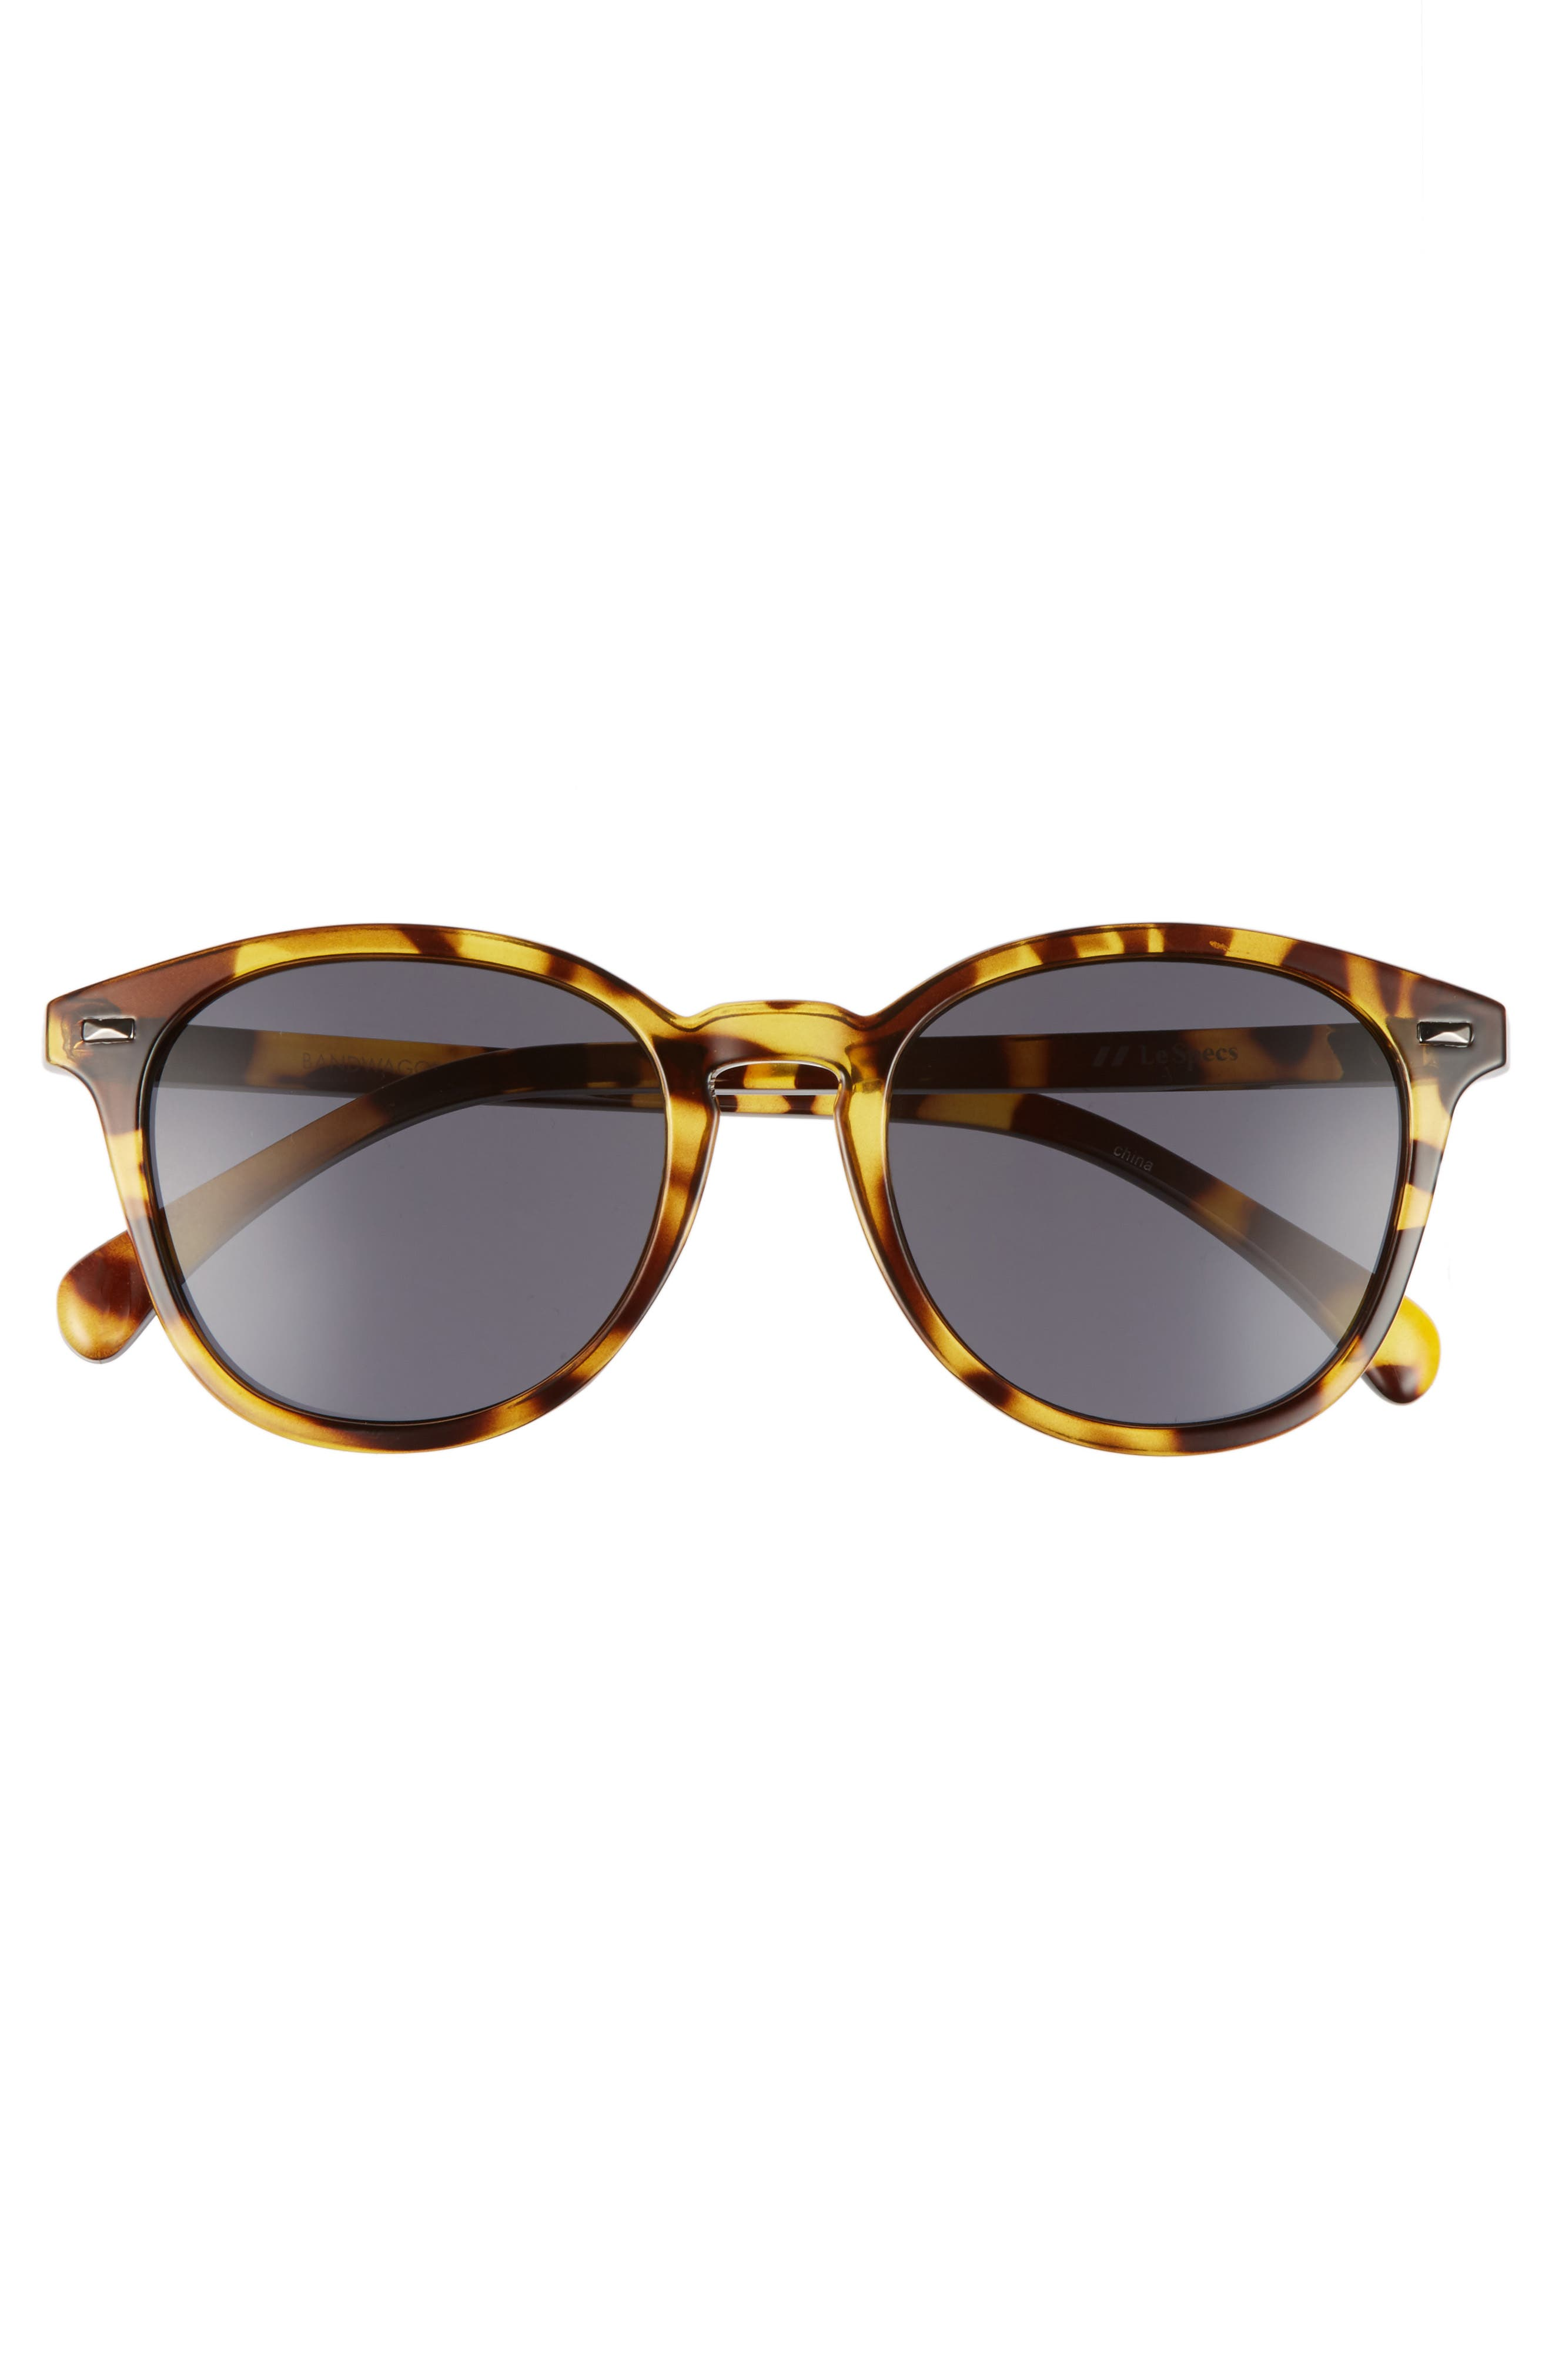 Bandwagon 50mm Sunglasses,                             Alternate thumbnail 3, color,                             SYRUP TORTOISE